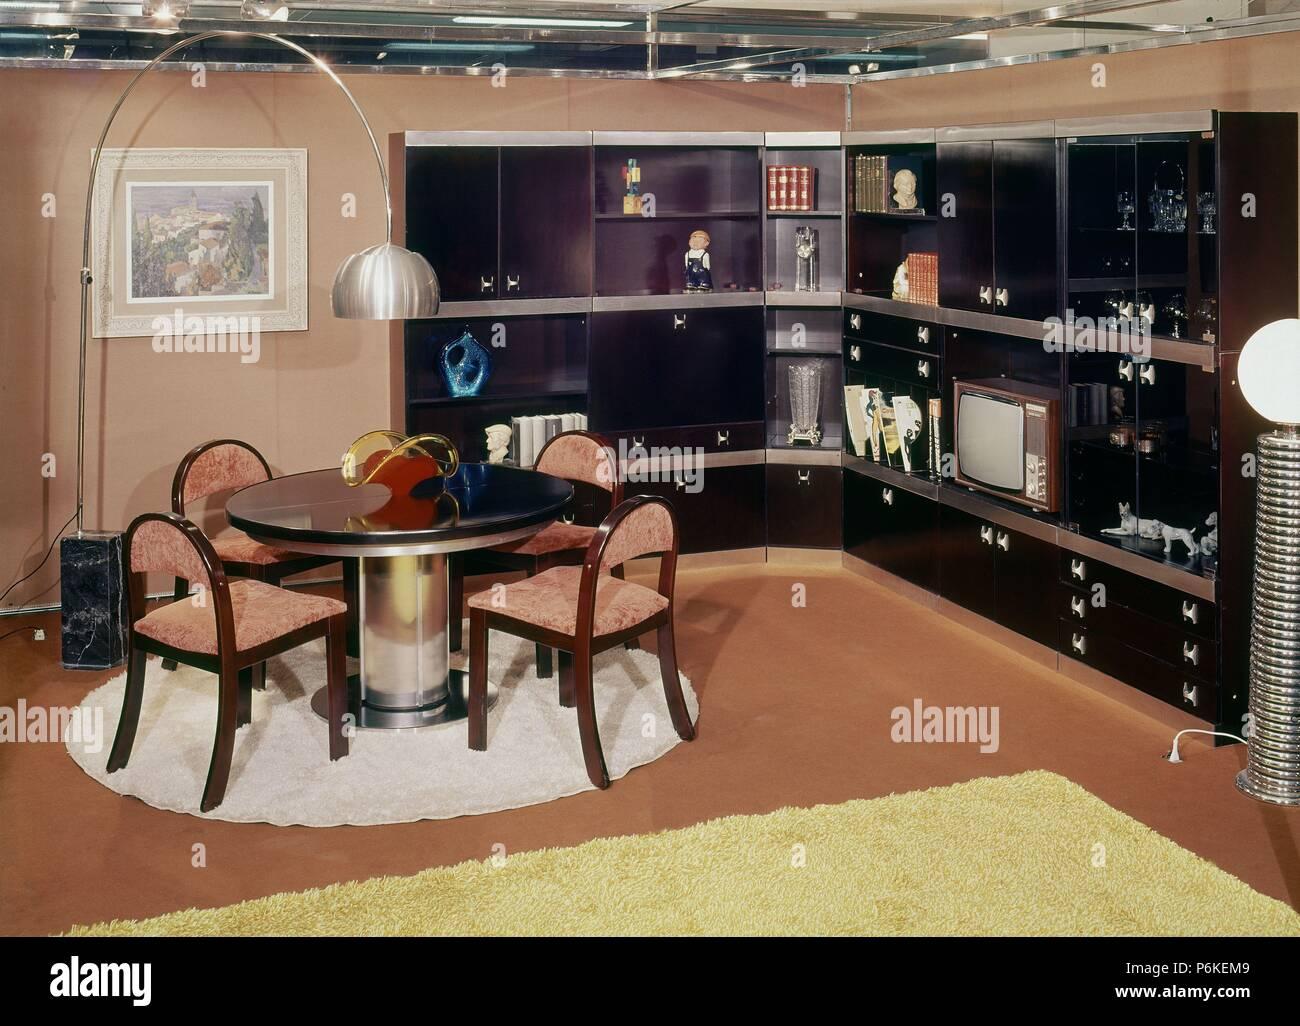 DECORACION-salon Comedor: Años 70 Stockfoto, Bild: 210640985 ...